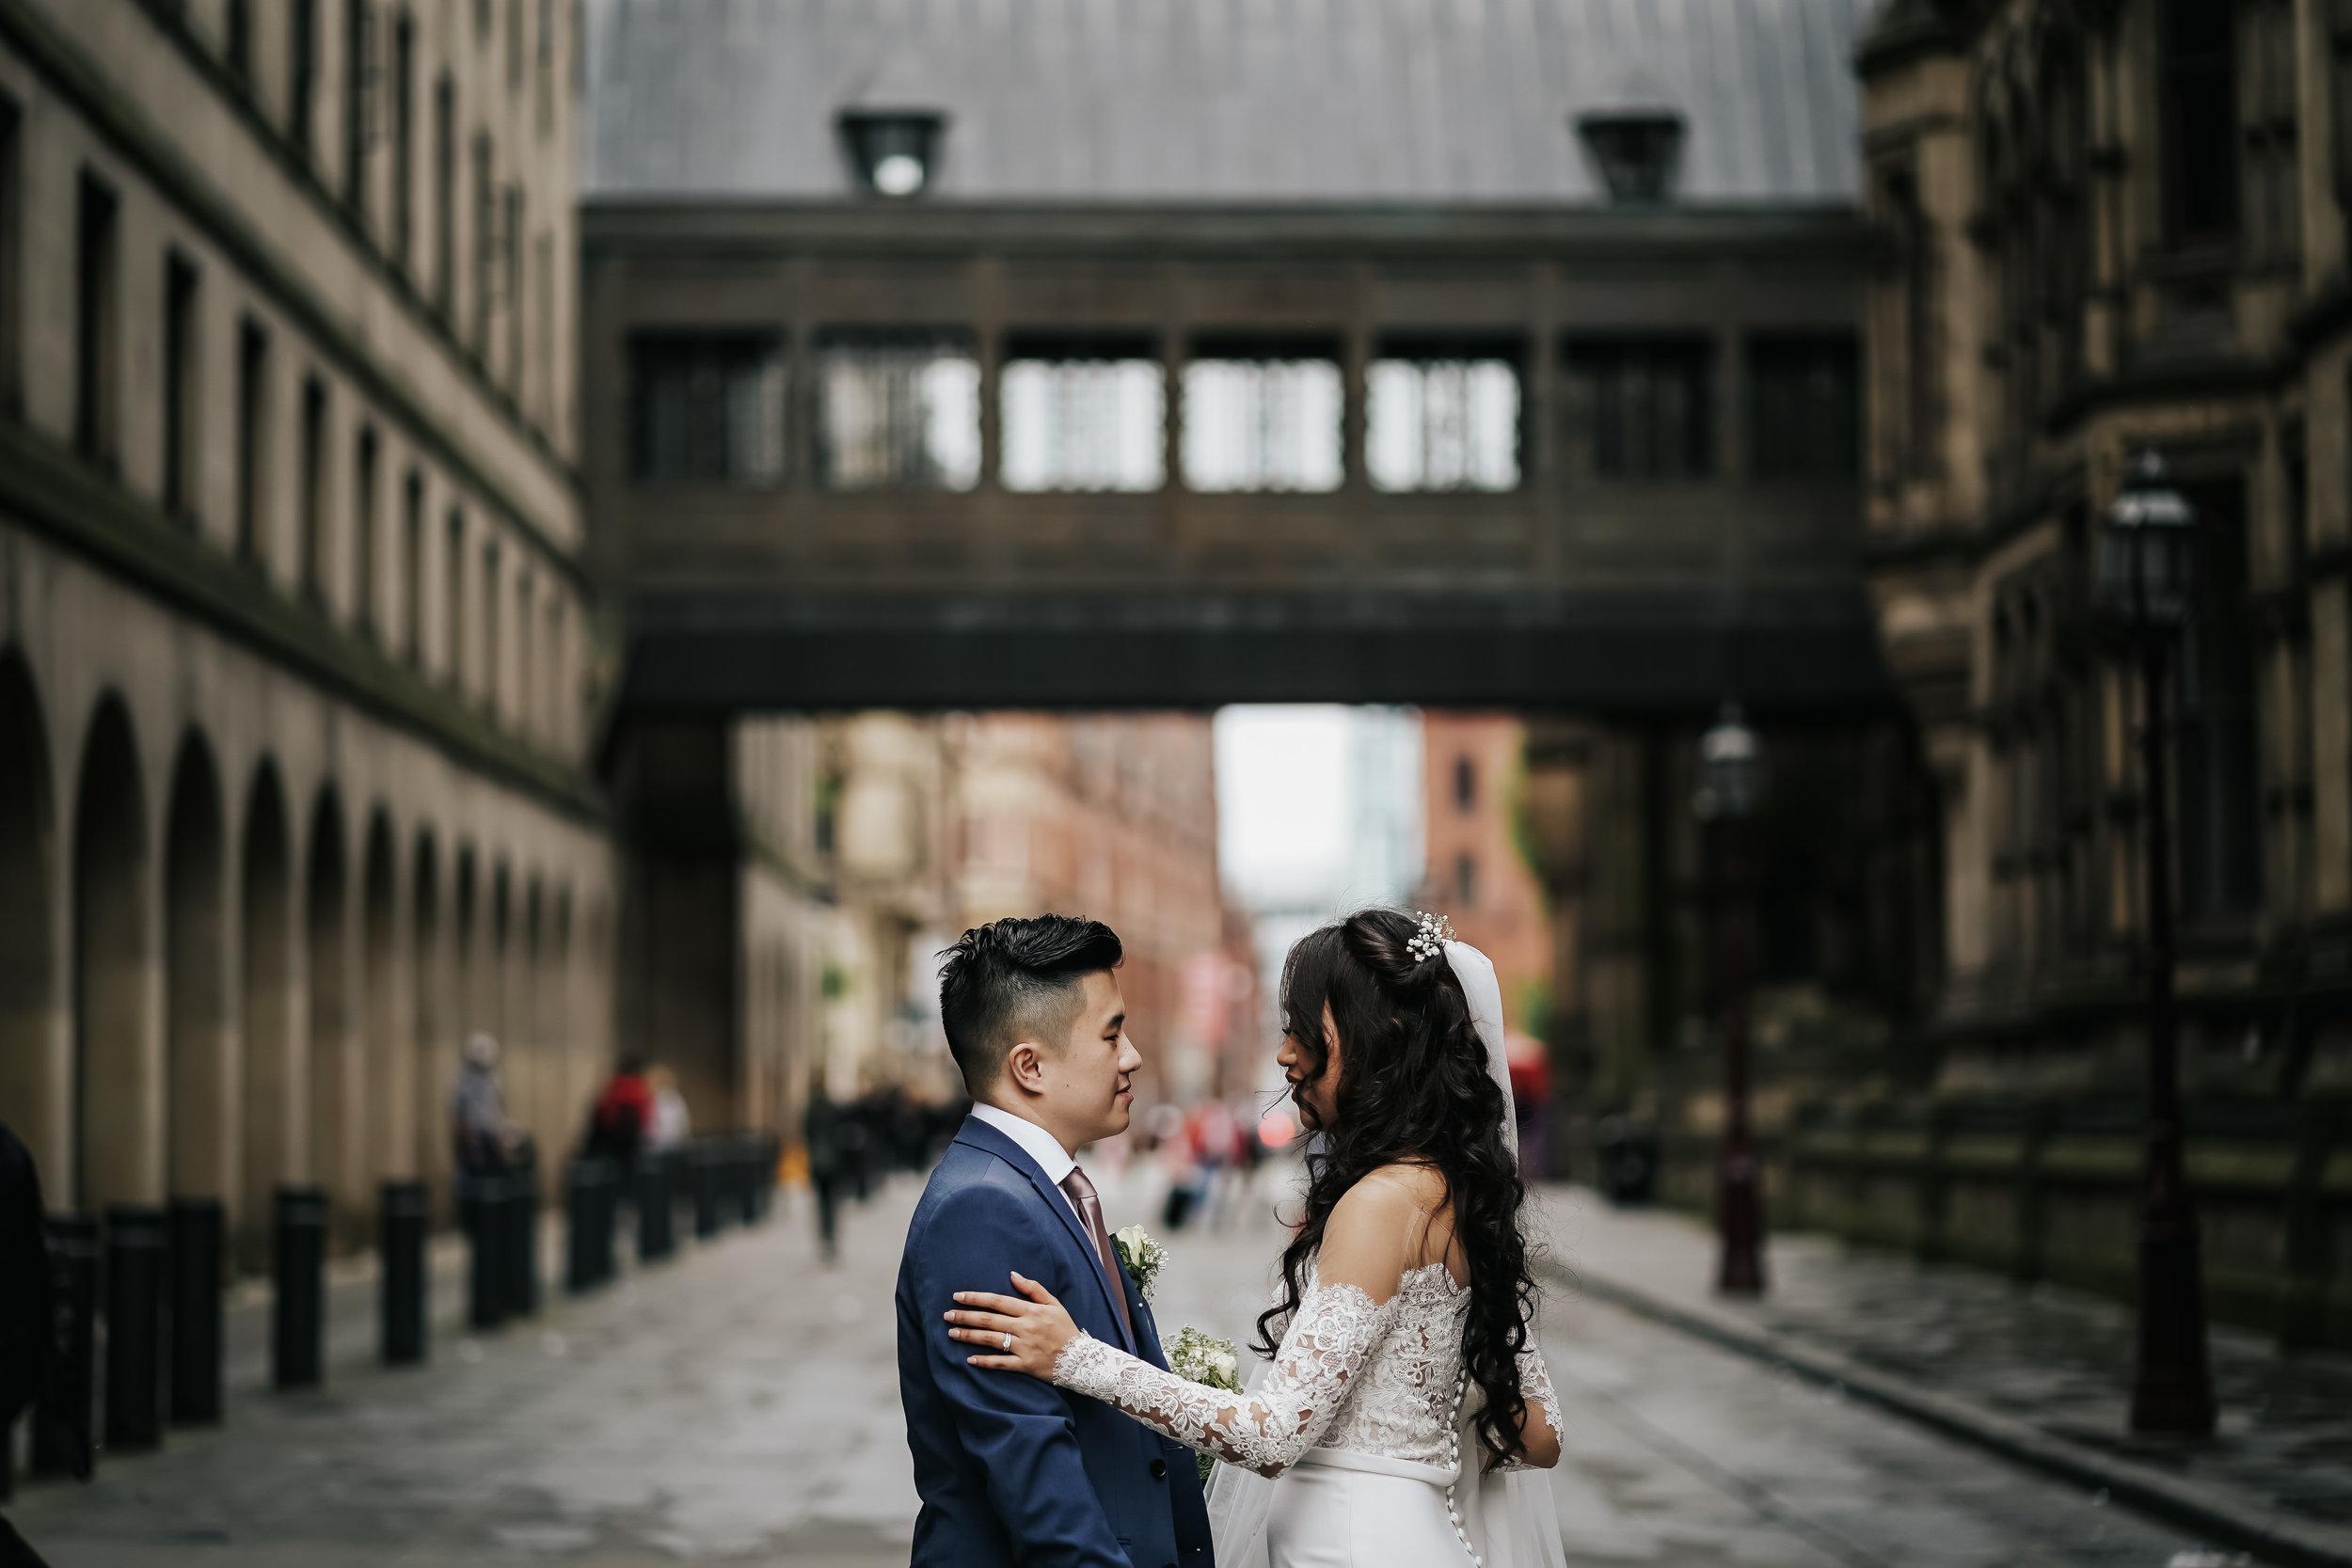 Chinese Wedding Photography Manchester wedding photographer Cheshire - 029.jpg